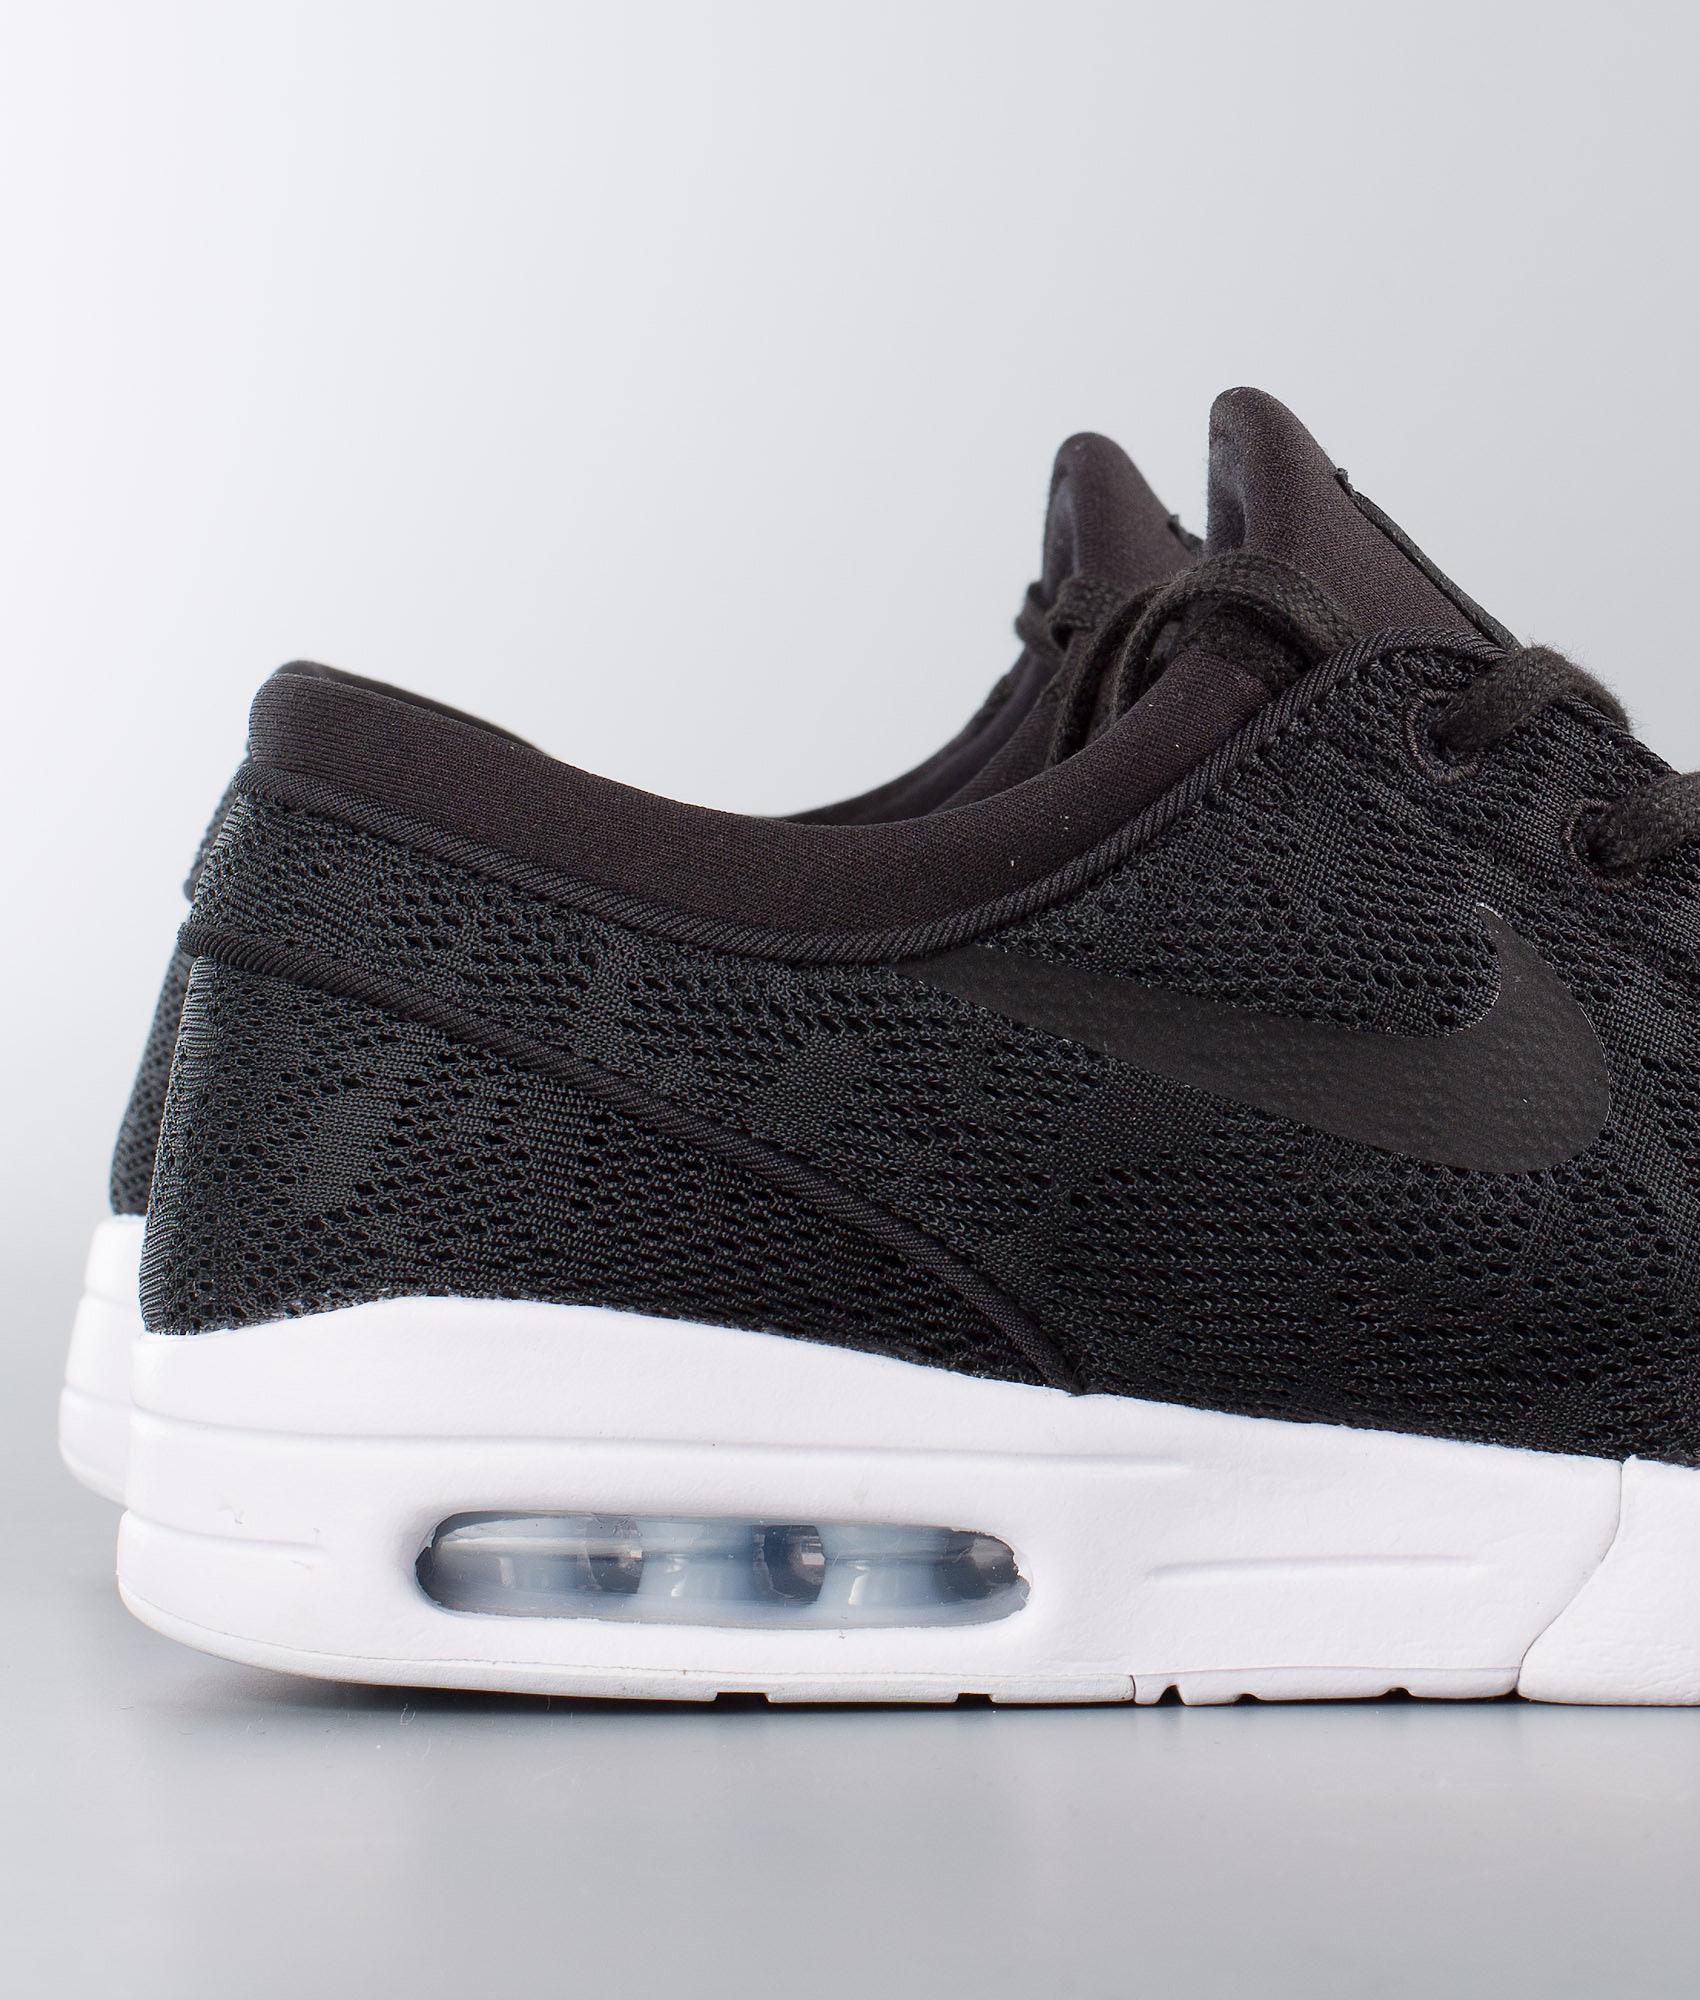 Nike Stefan Janoski Max Shoes Black Black-White - Ridestore.com 2df33aeaf0